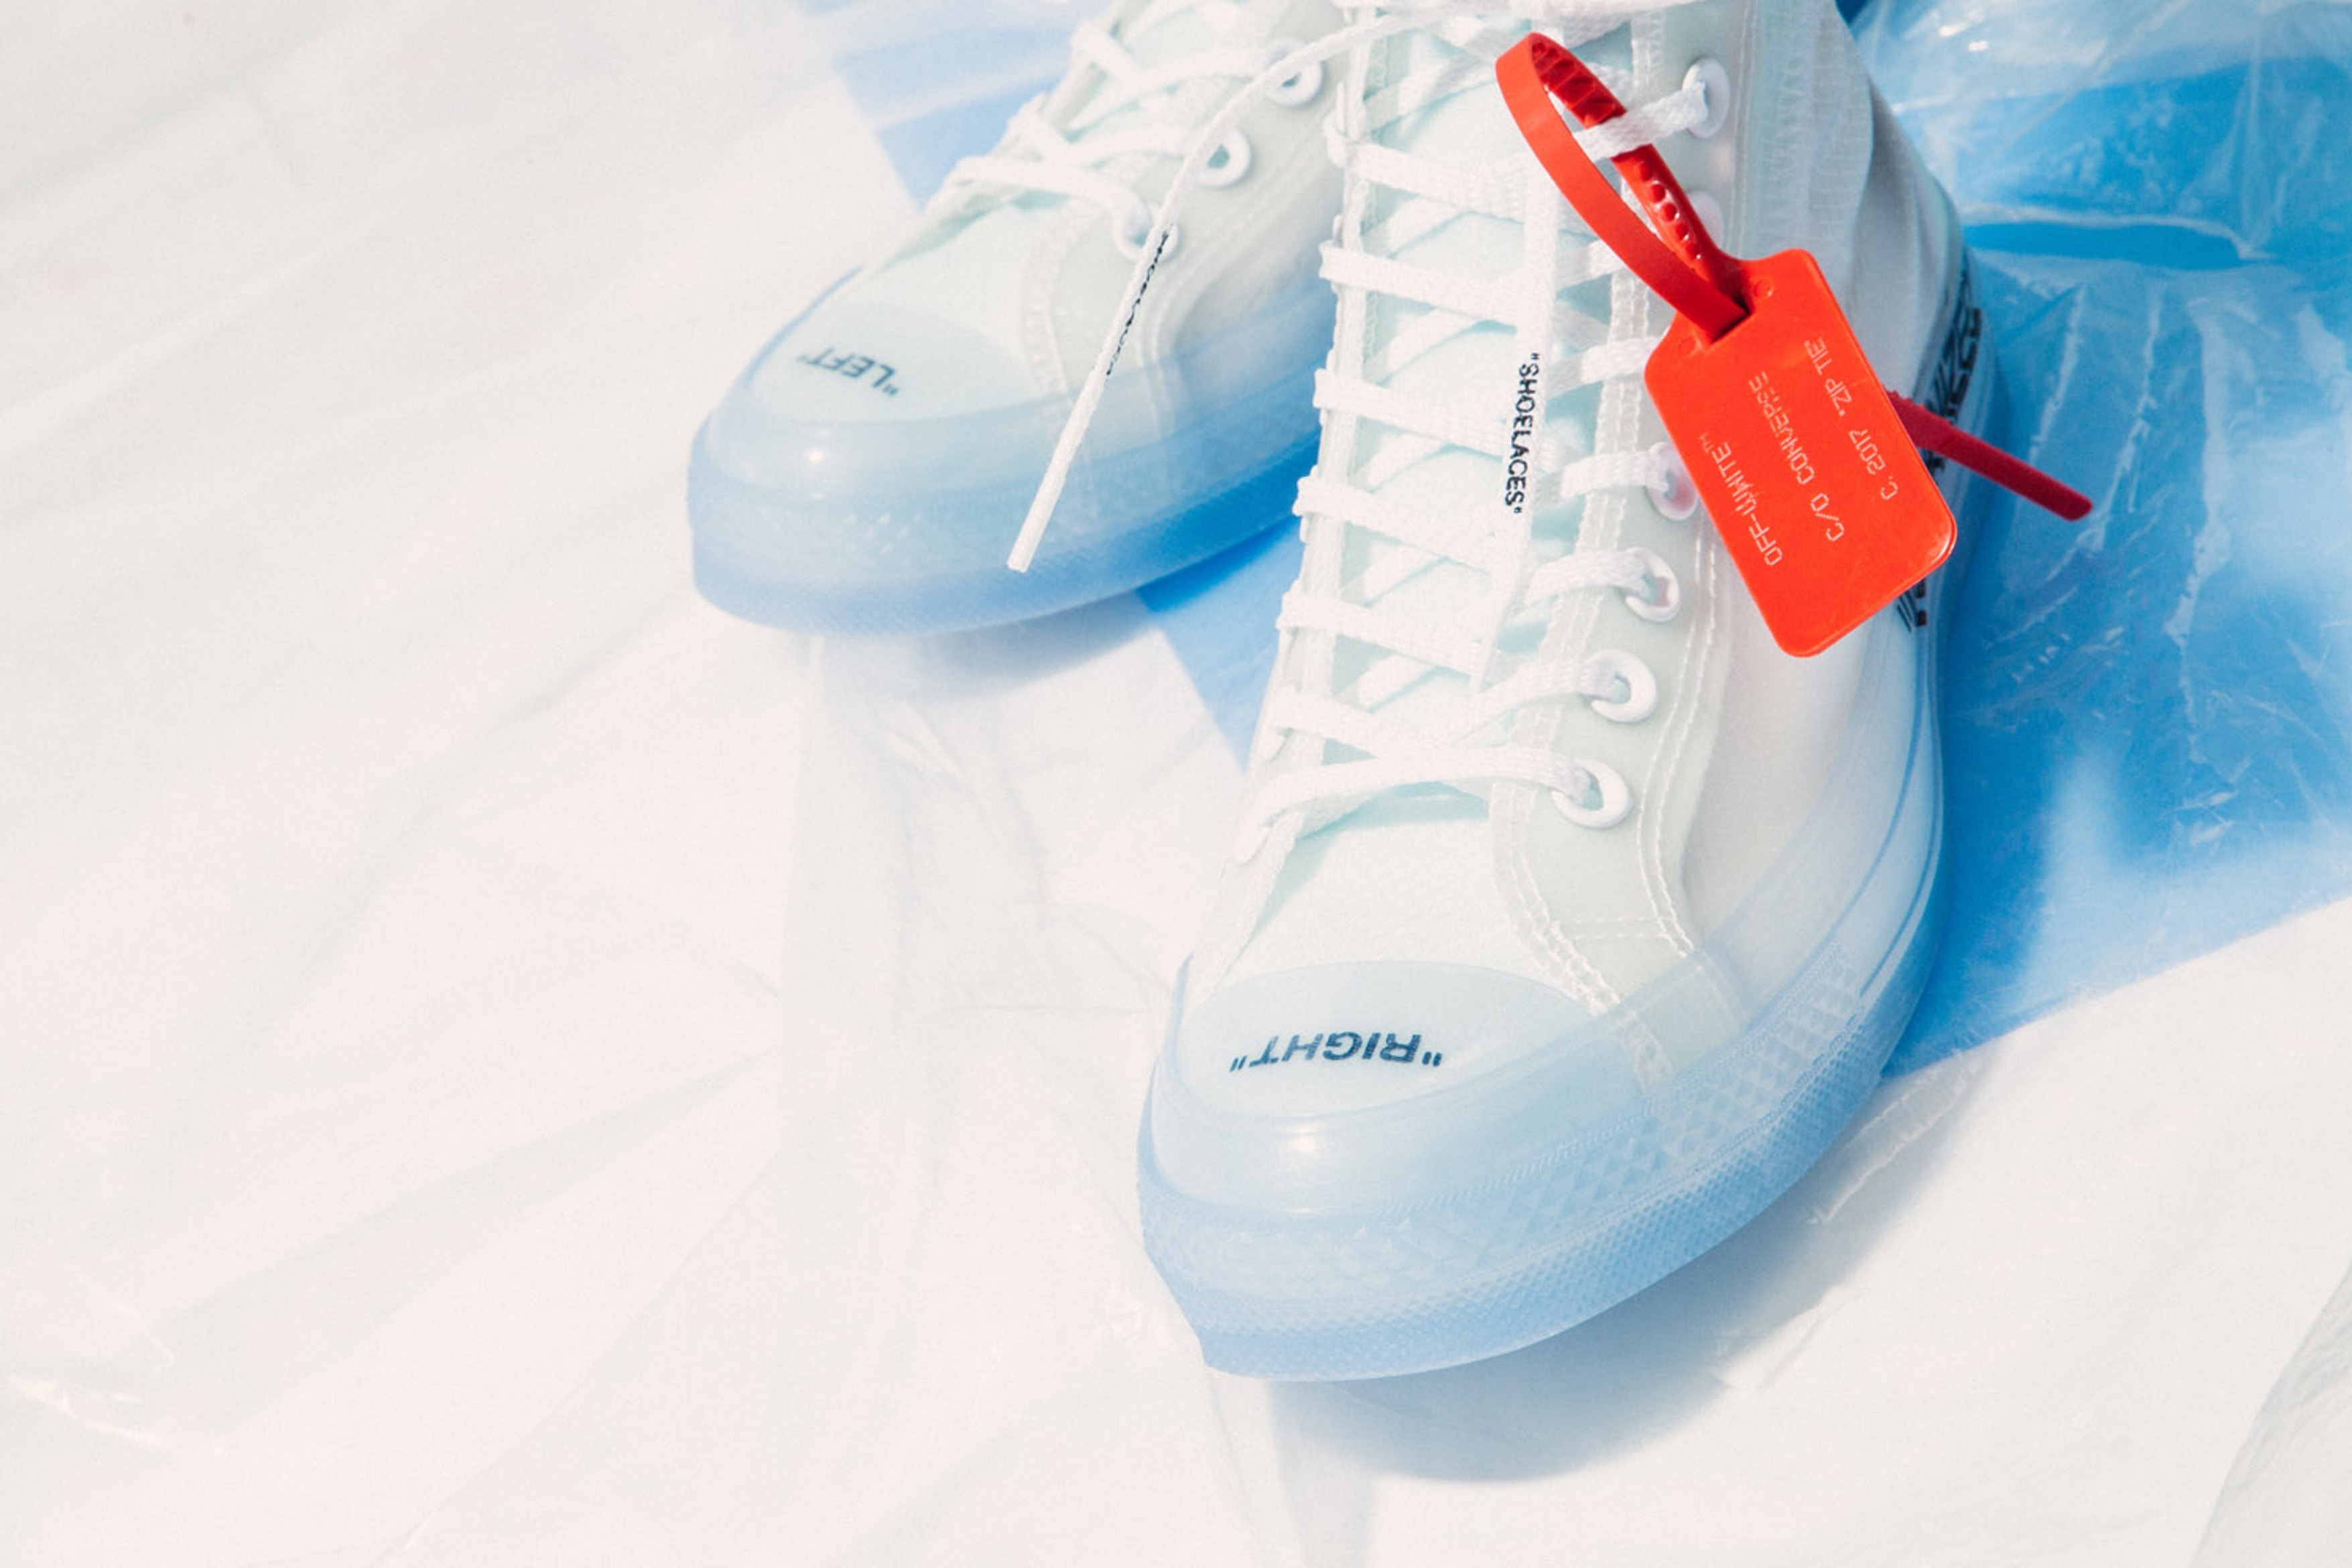 c6cade9dd34747 converse-virgil-abloh-chuck-70-the-ten-closer-look-4 - Sneaker Myth